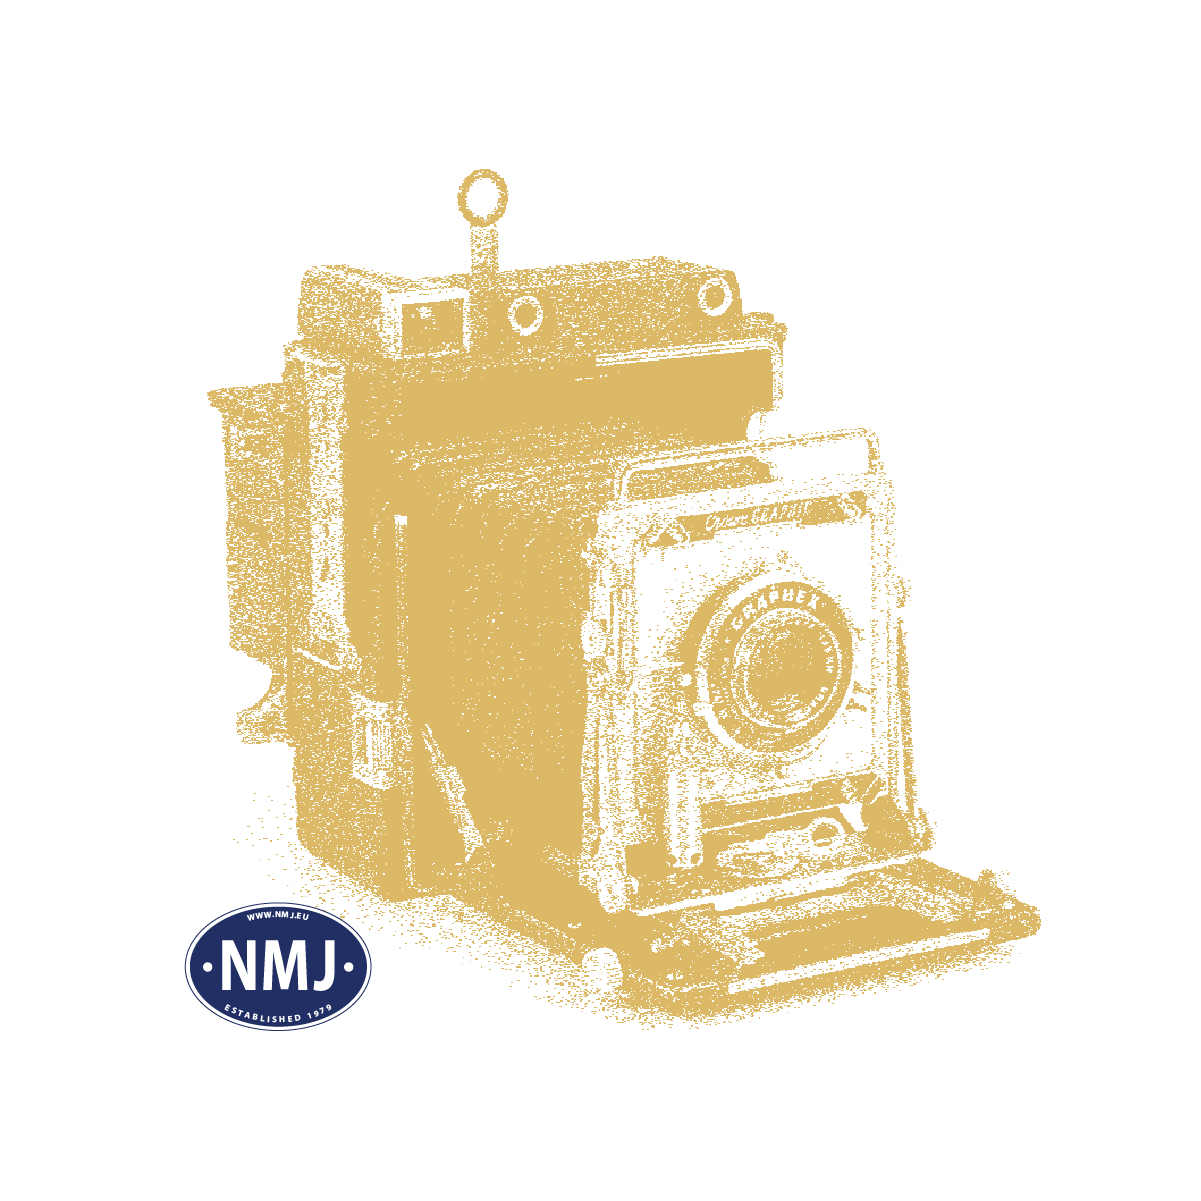 NMJT504.104 - NMJ Topline NSB  G5 44007, type 1 original livery